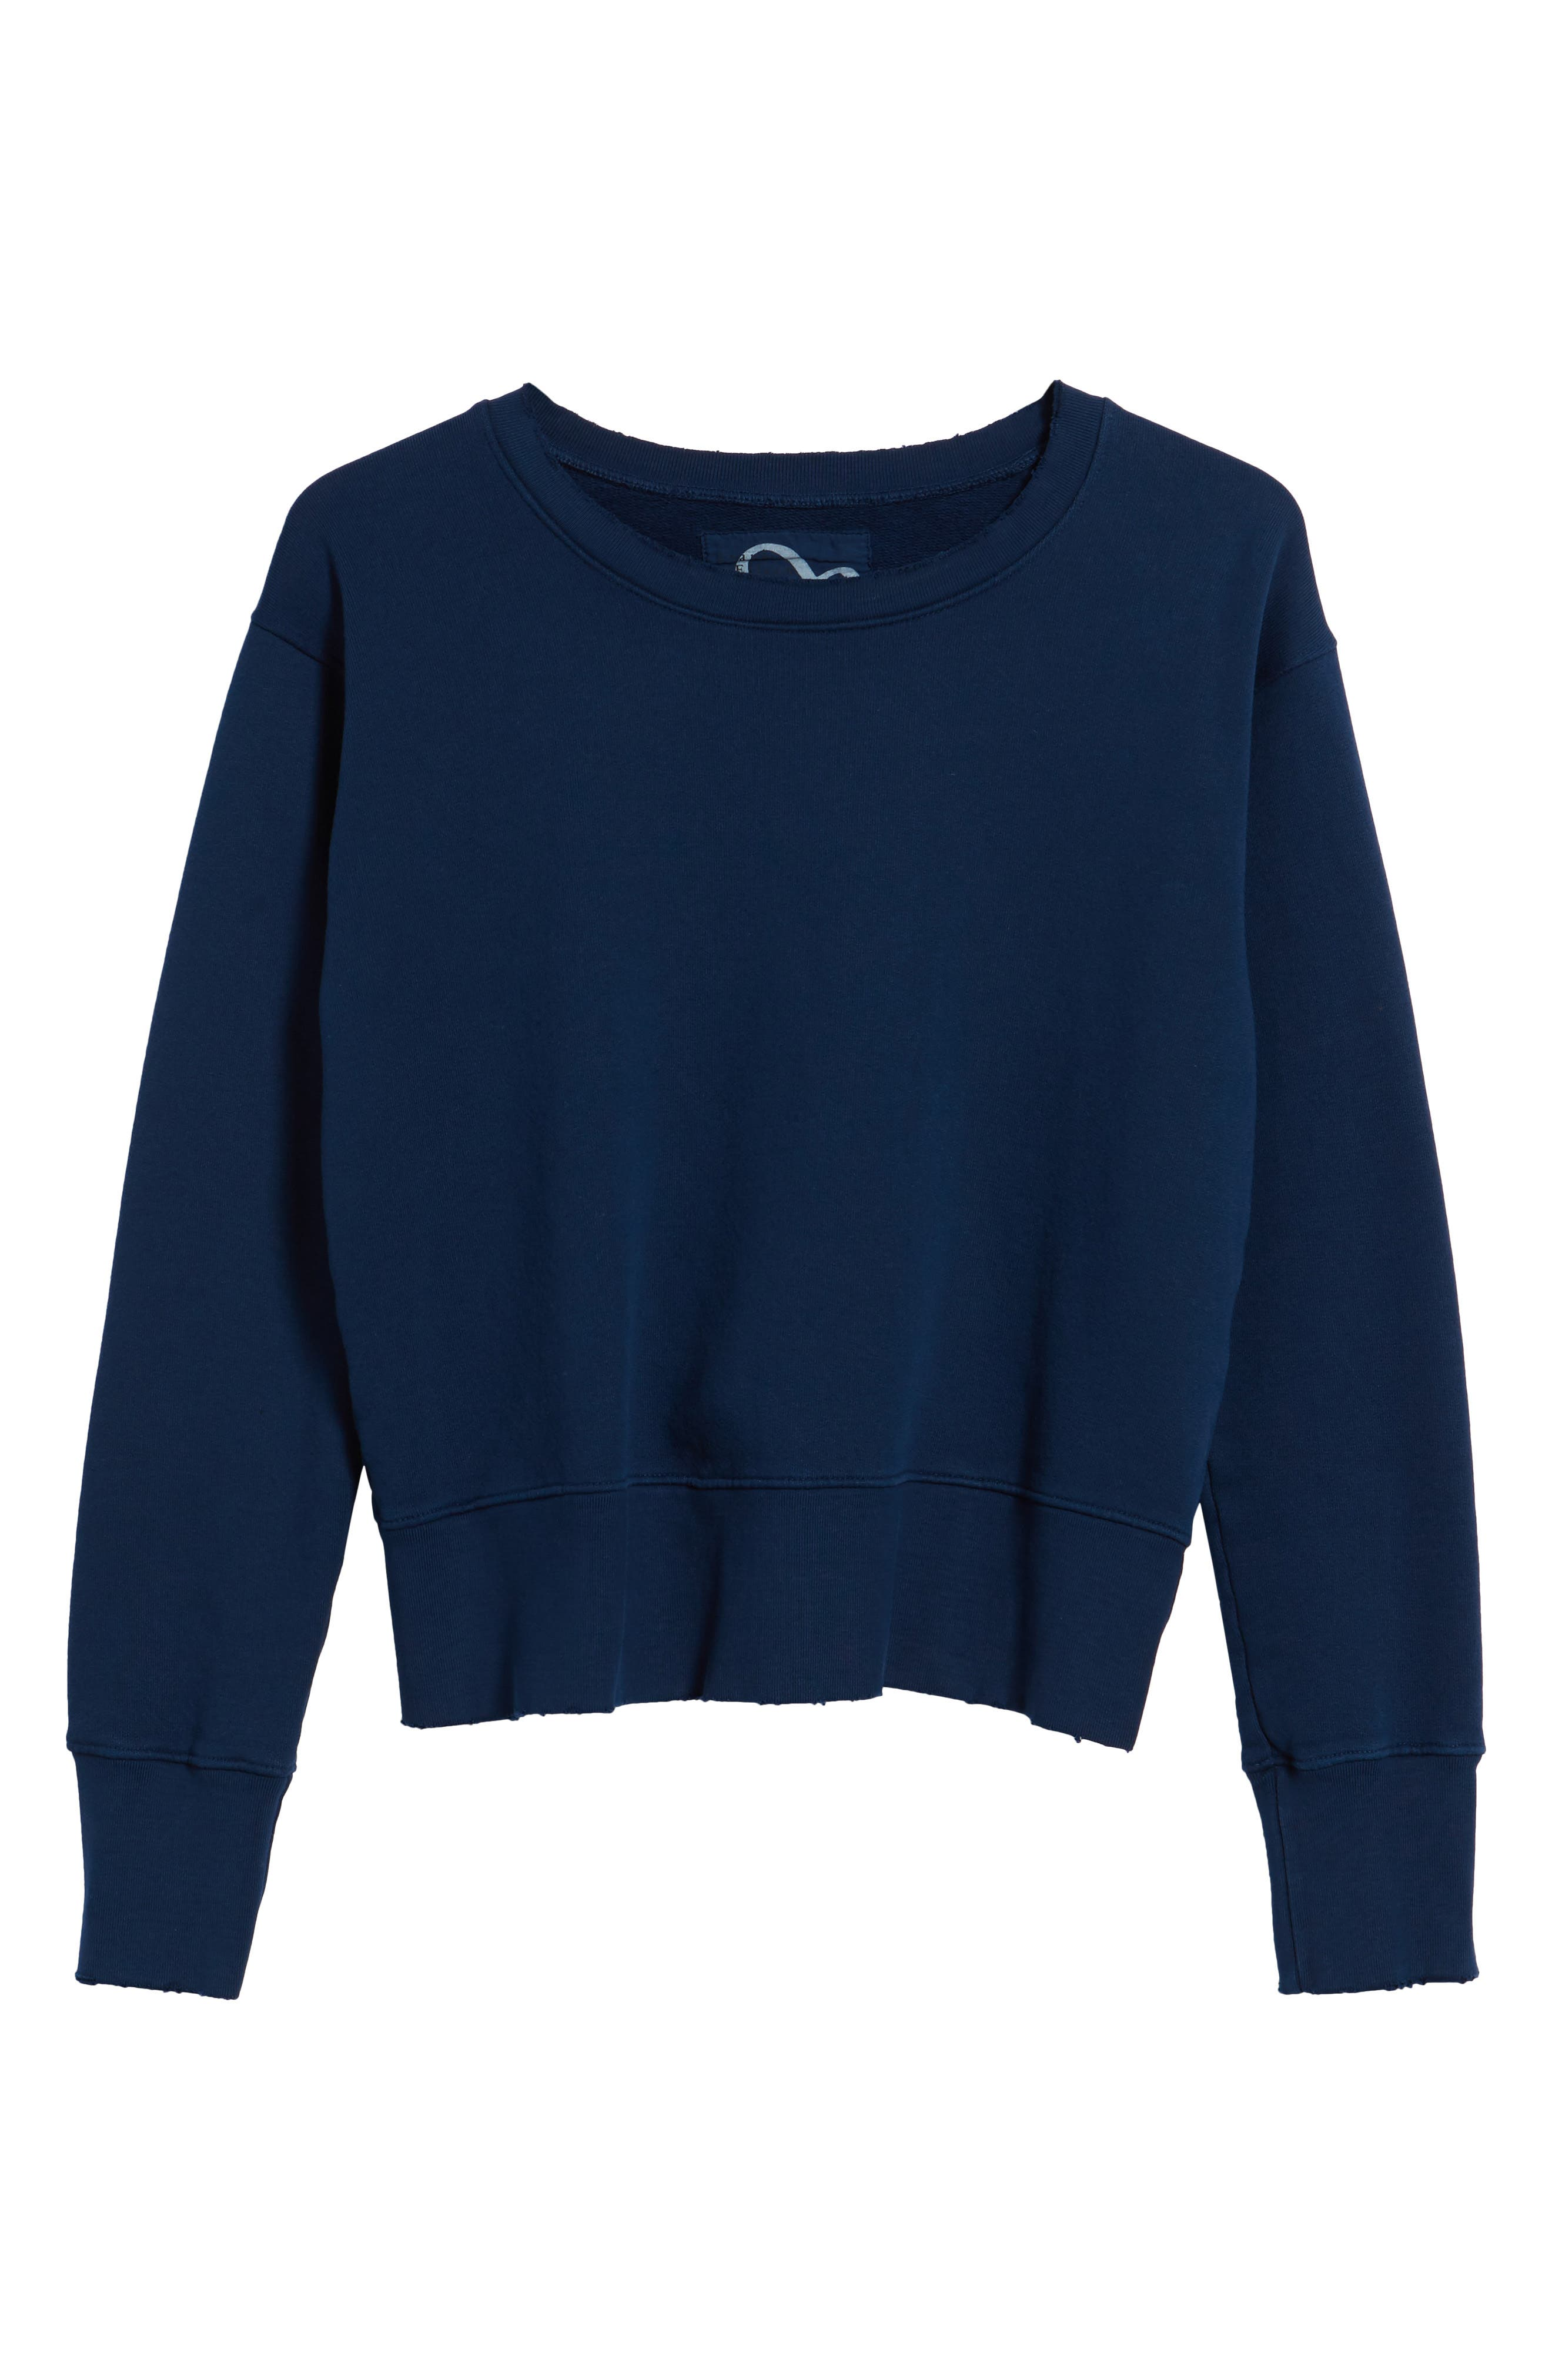 Distressed Sweatshirt,                             Alternate thumbnail 6, color,